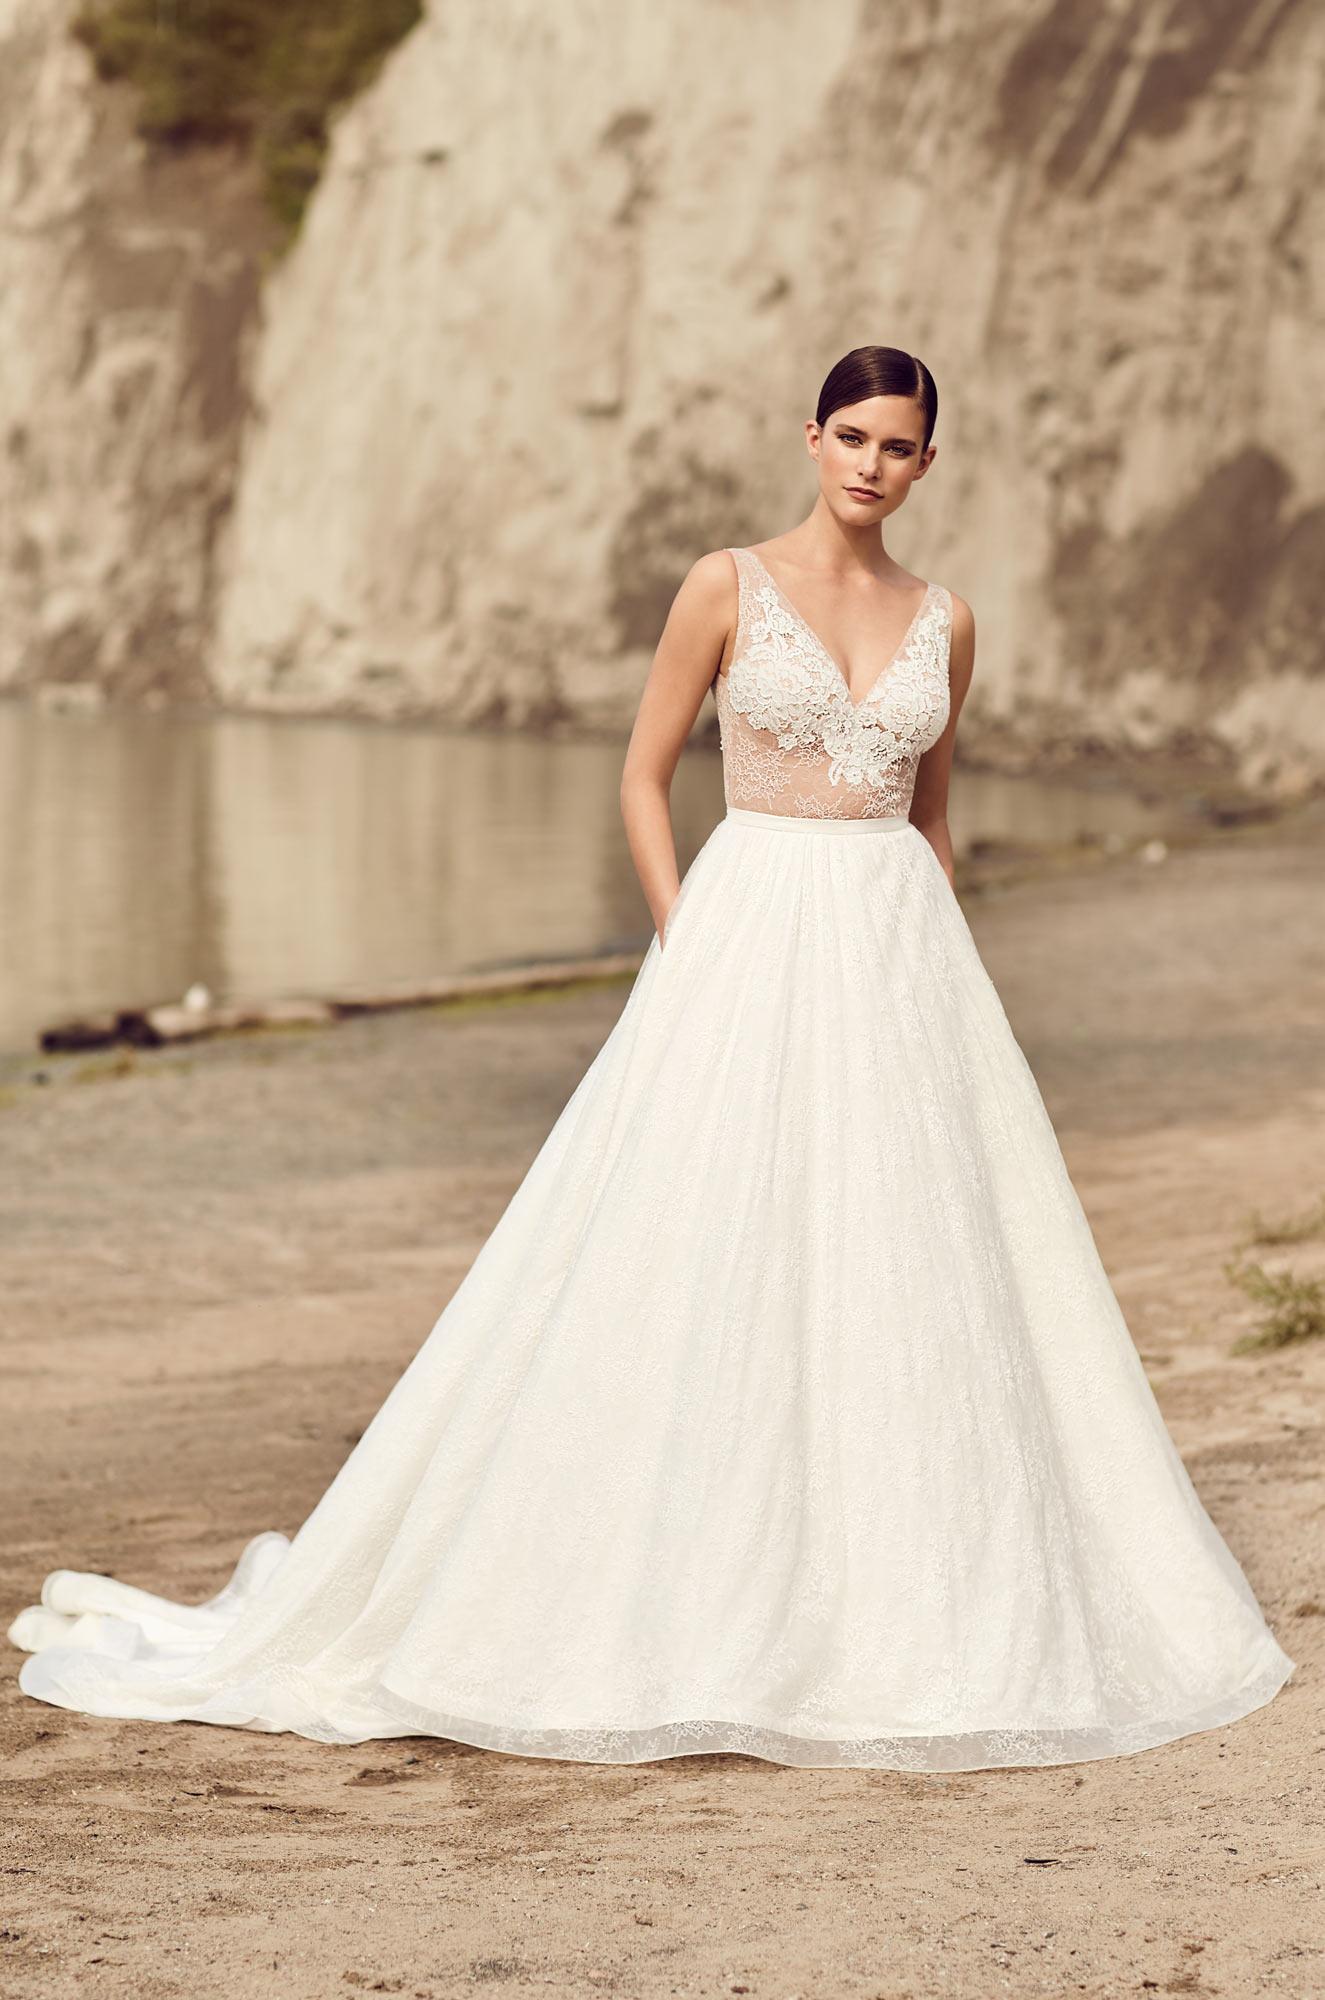 Illusion Lace Bodice Wedding Dress - Style #2114 | Mikaella Bridal